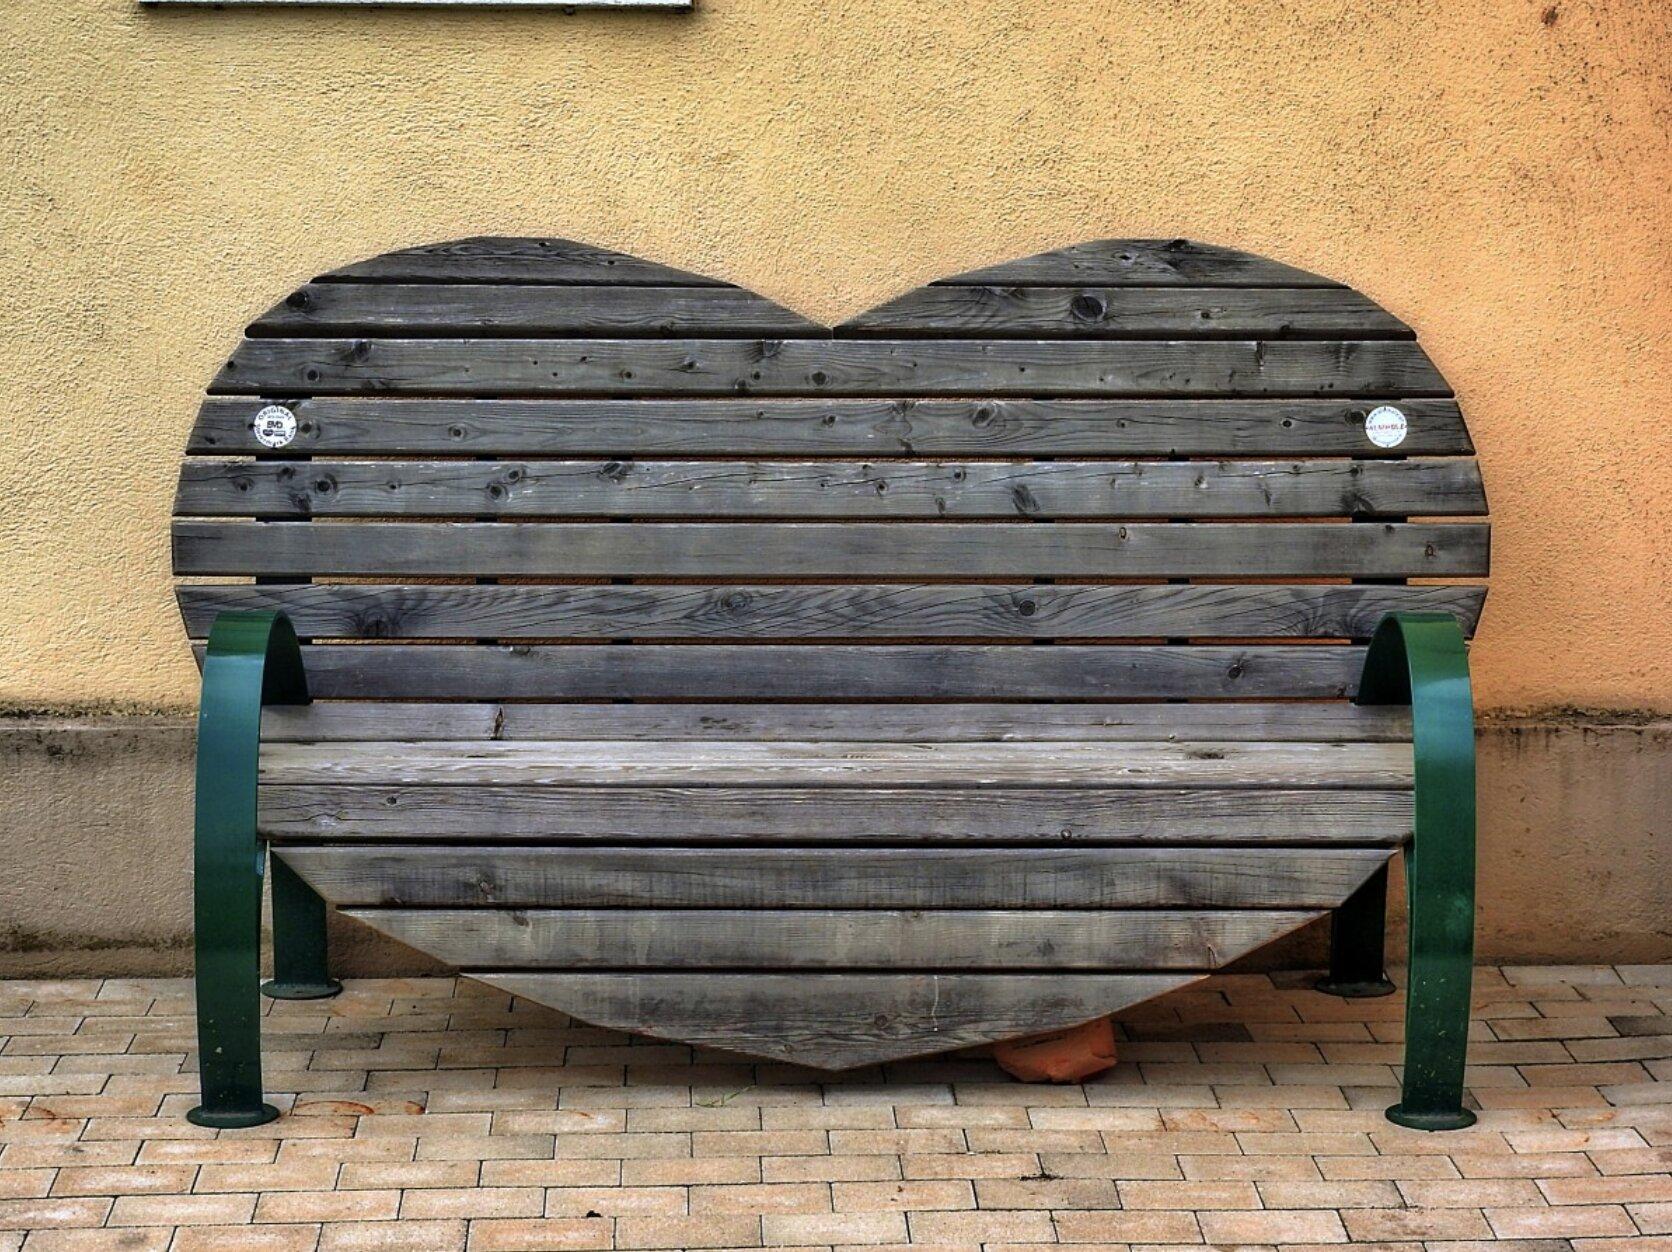 Heart shaped bench